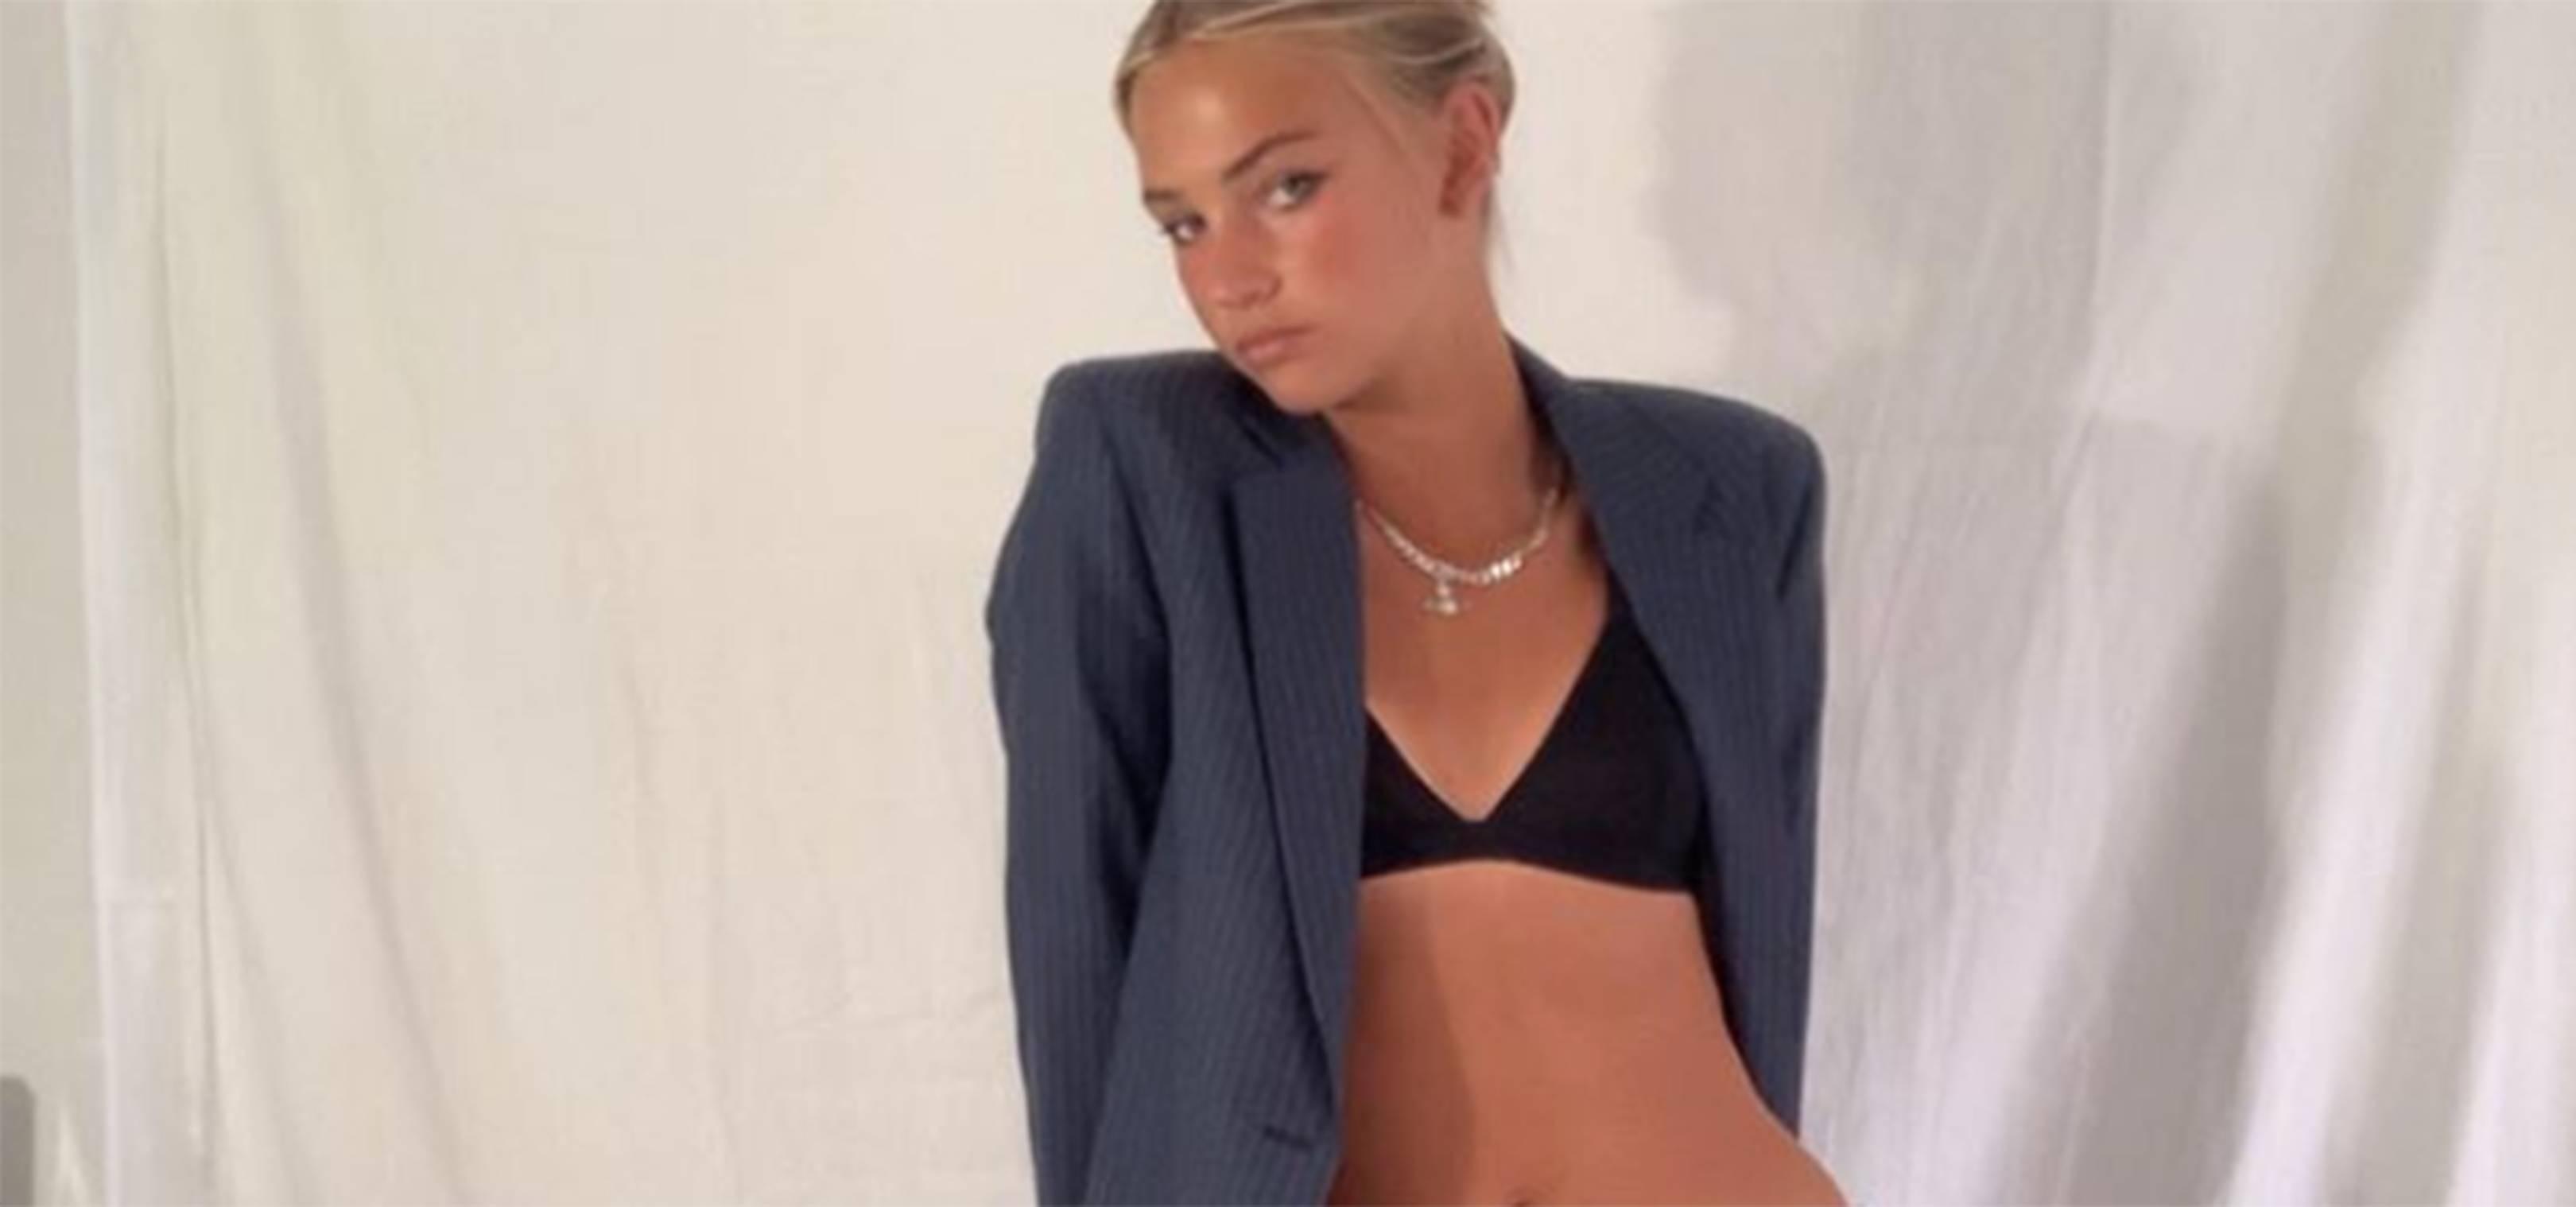 Is Romeo Beckham's girlfriend, Mia Regan, the next big thing in fashion?